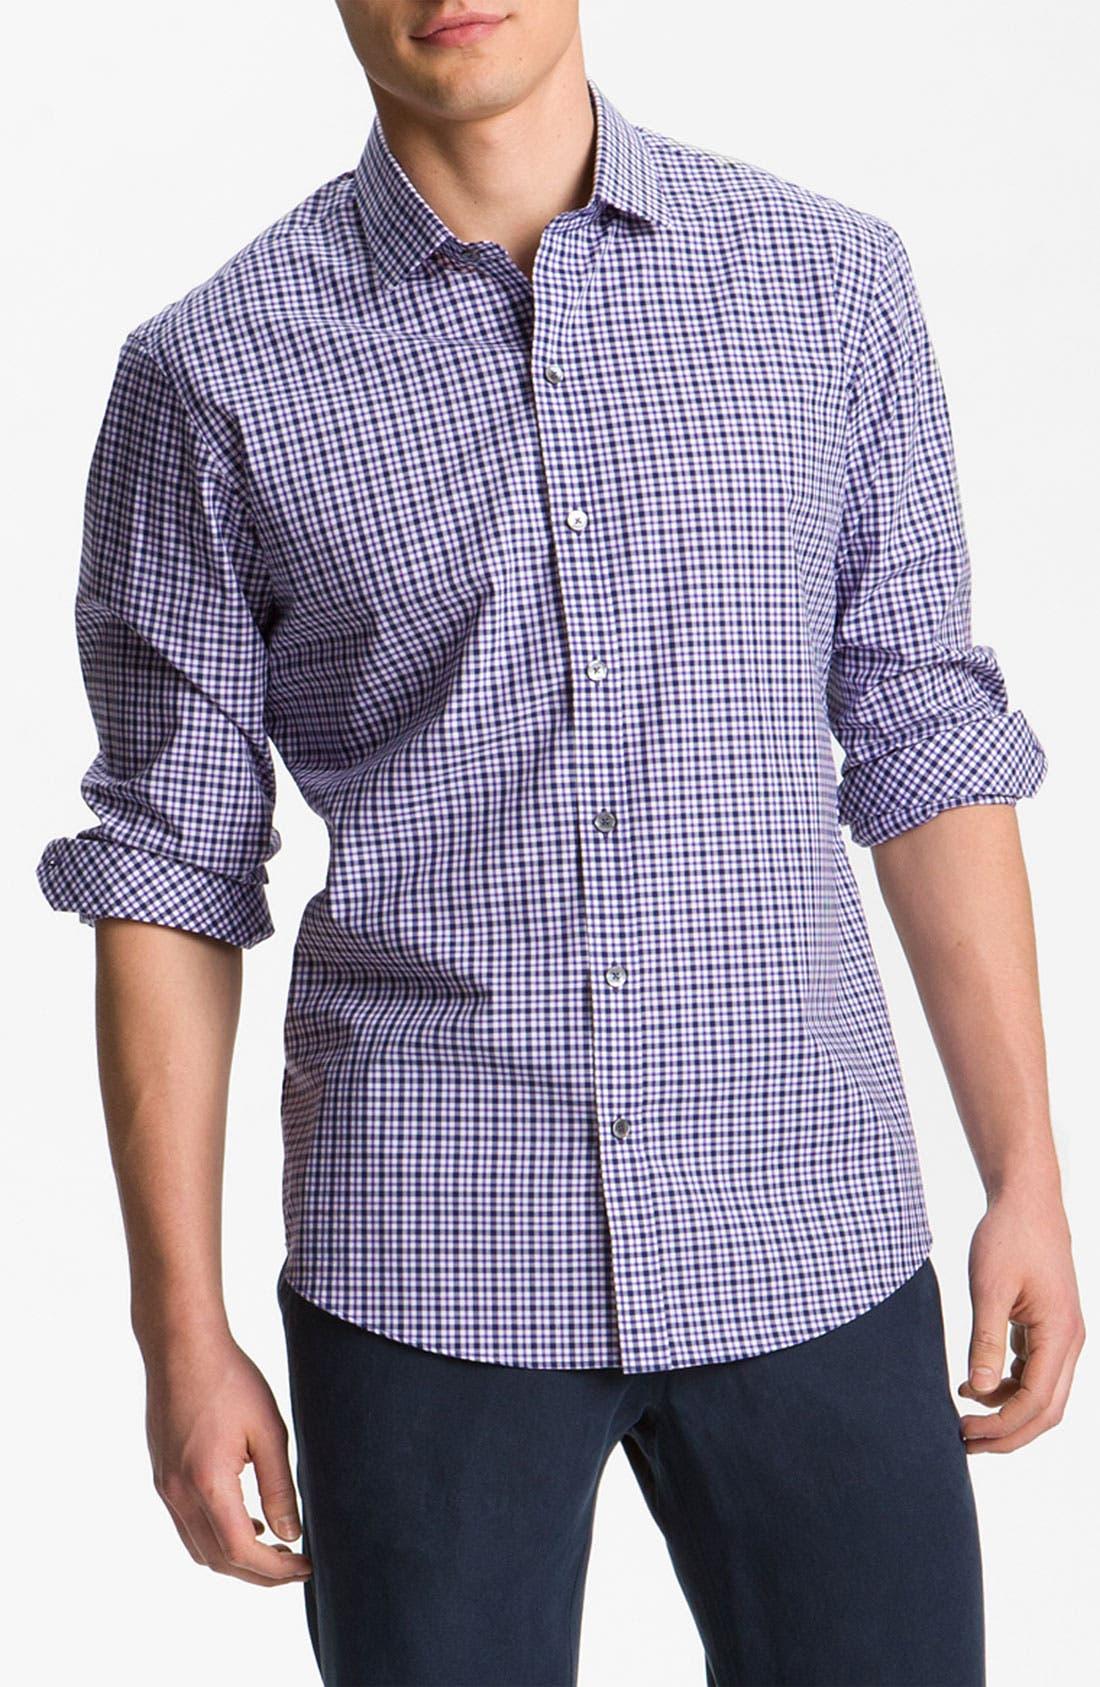 Alternate Image 1 Selected - Zachary Prell 'Pallante' Sport Shirt